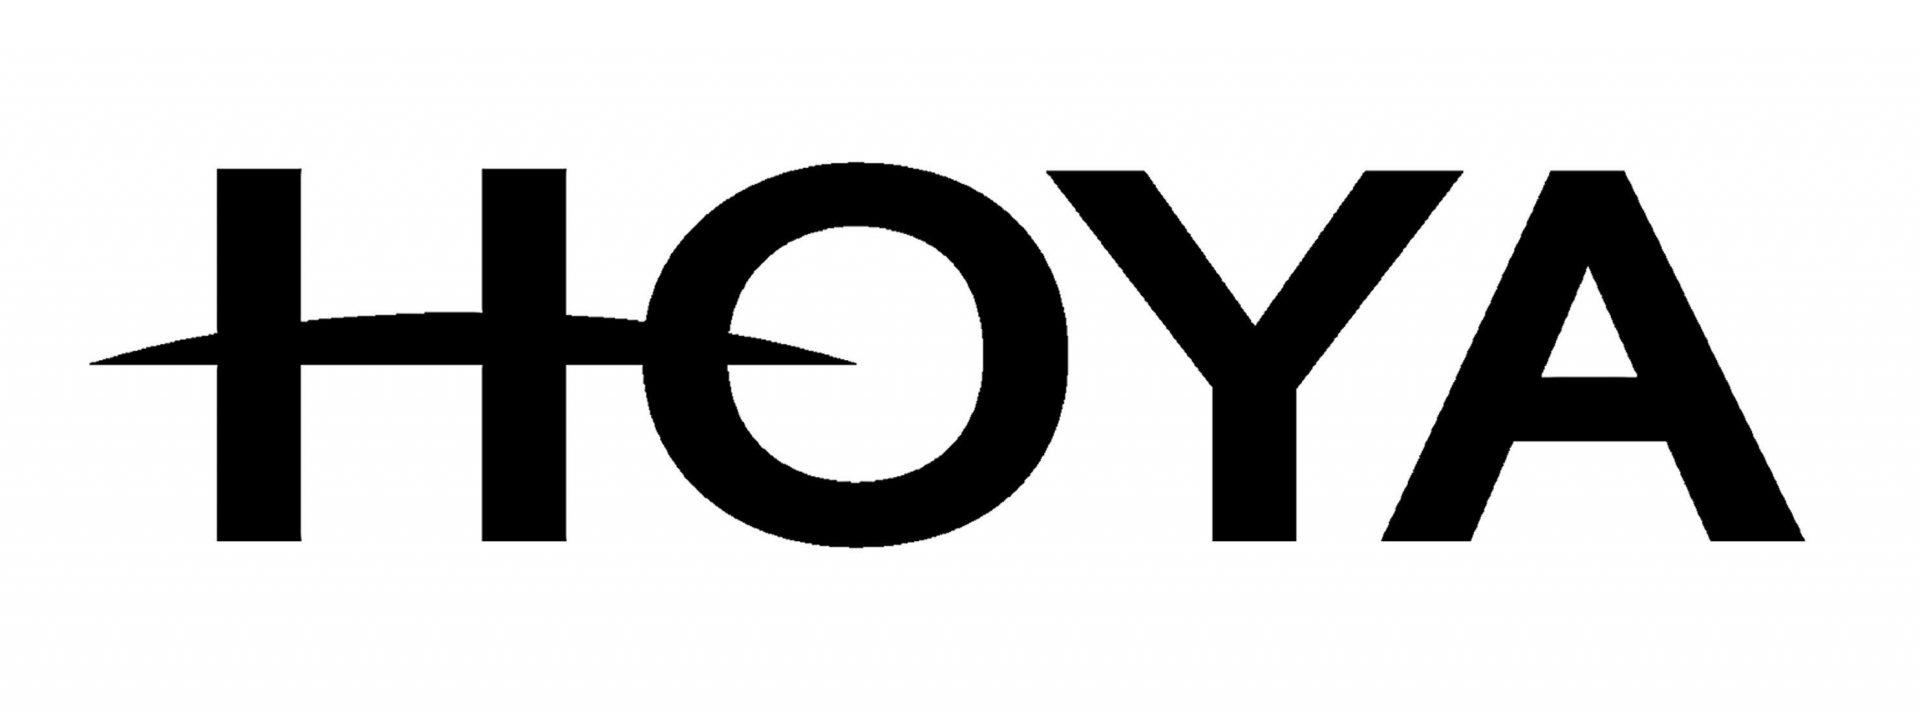 Logo 2970x1100 Hoya